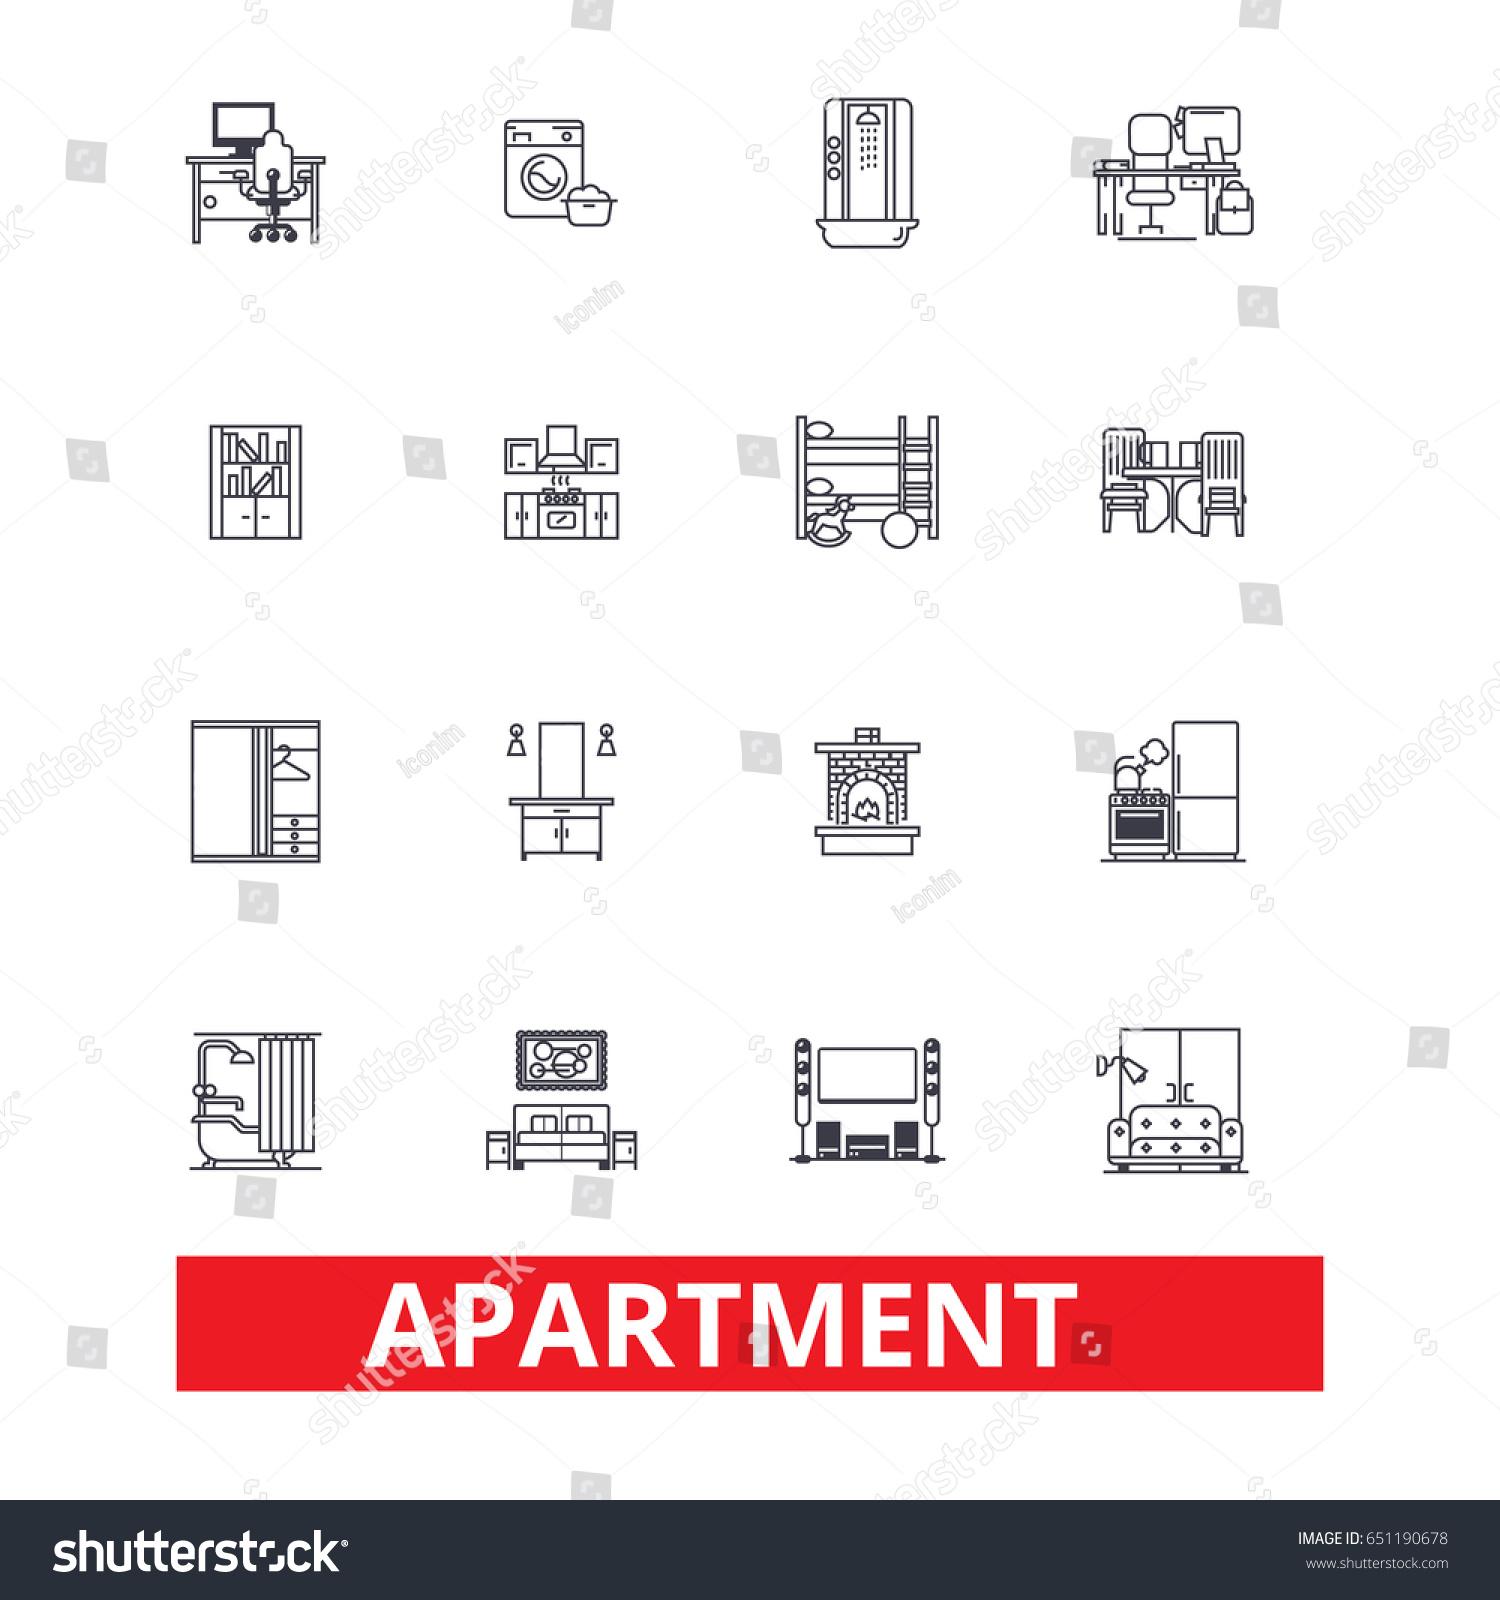 Apartment Building House Interior Flat Complex Stock Vector 651190678 Shutterstock